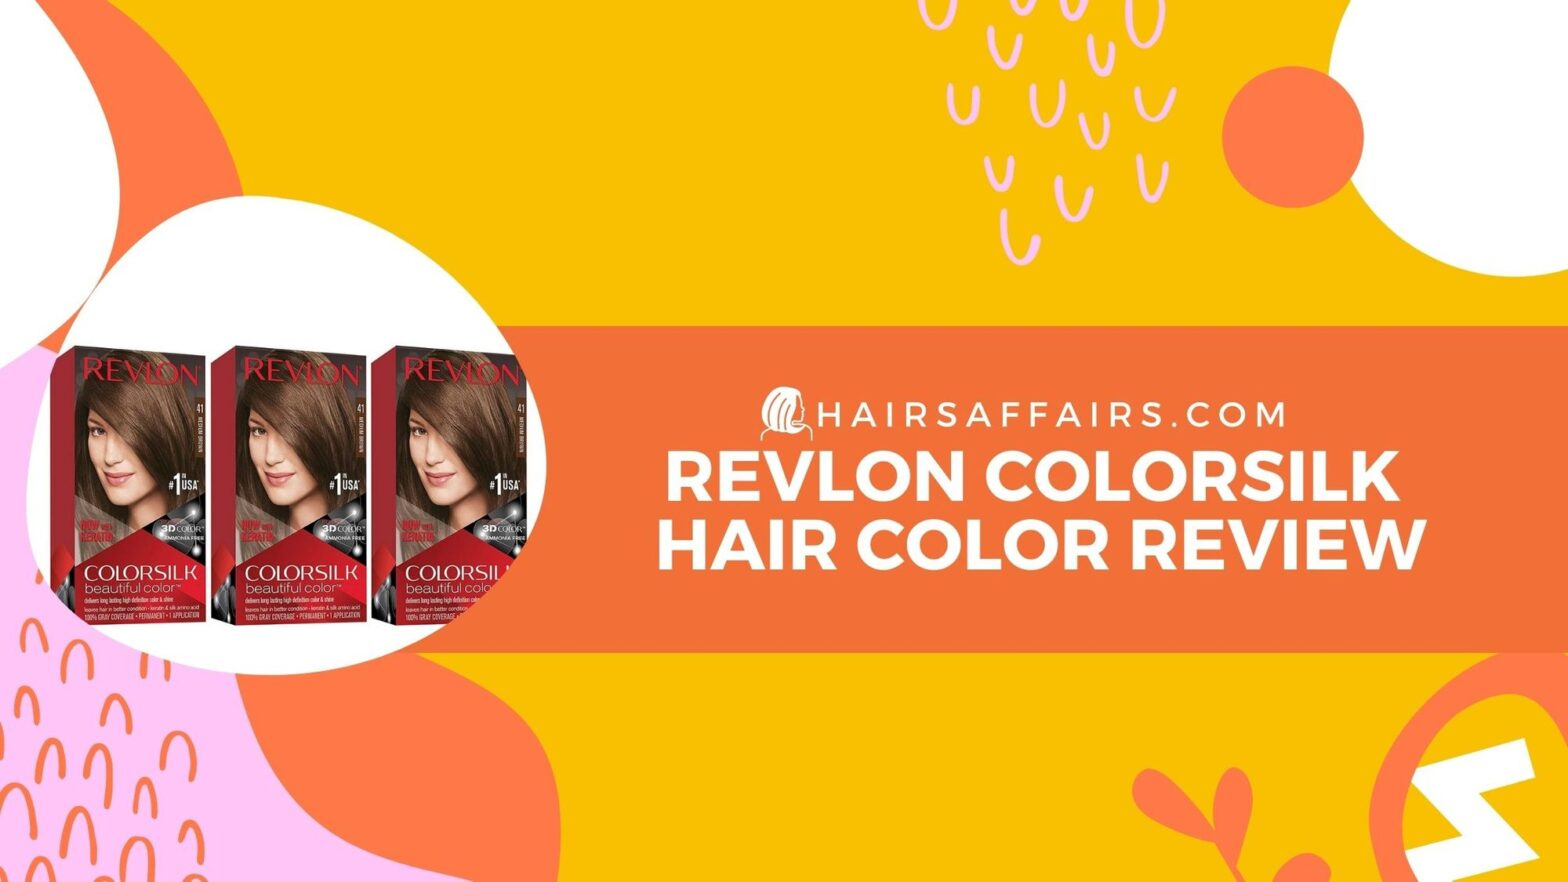 HA-Revlon-colorsilk-haircolor-review